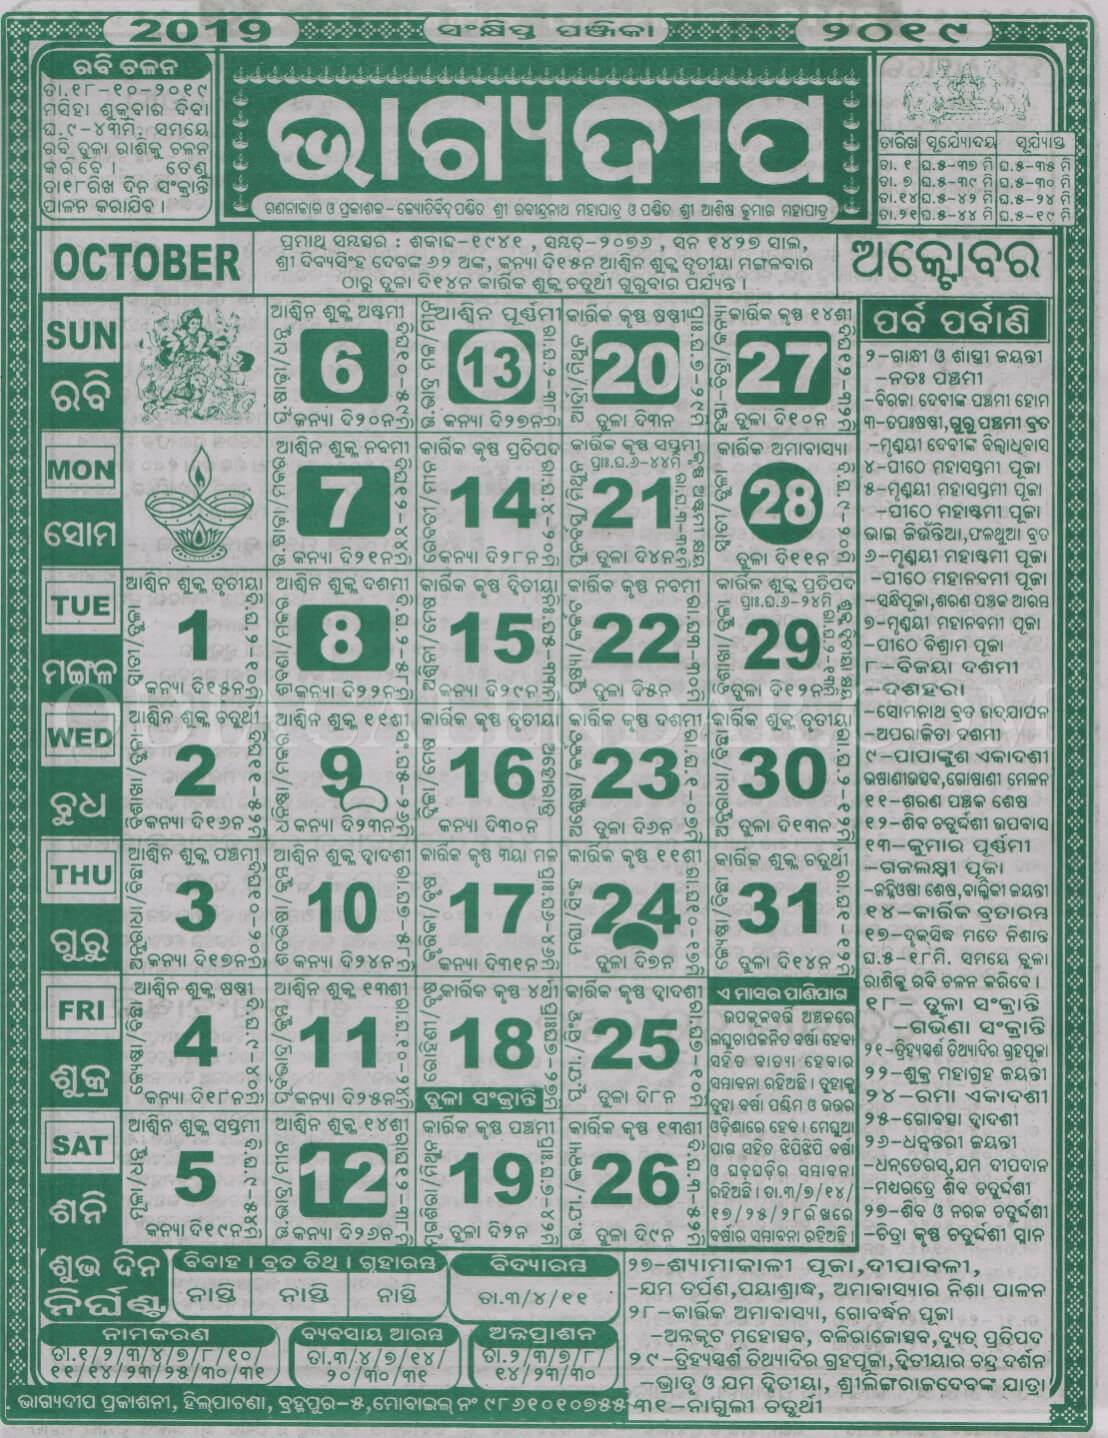 Odia Bhagyadeep Calendar 2020 October View And Download Free for Bhagyadeep Odia Calendar 2020